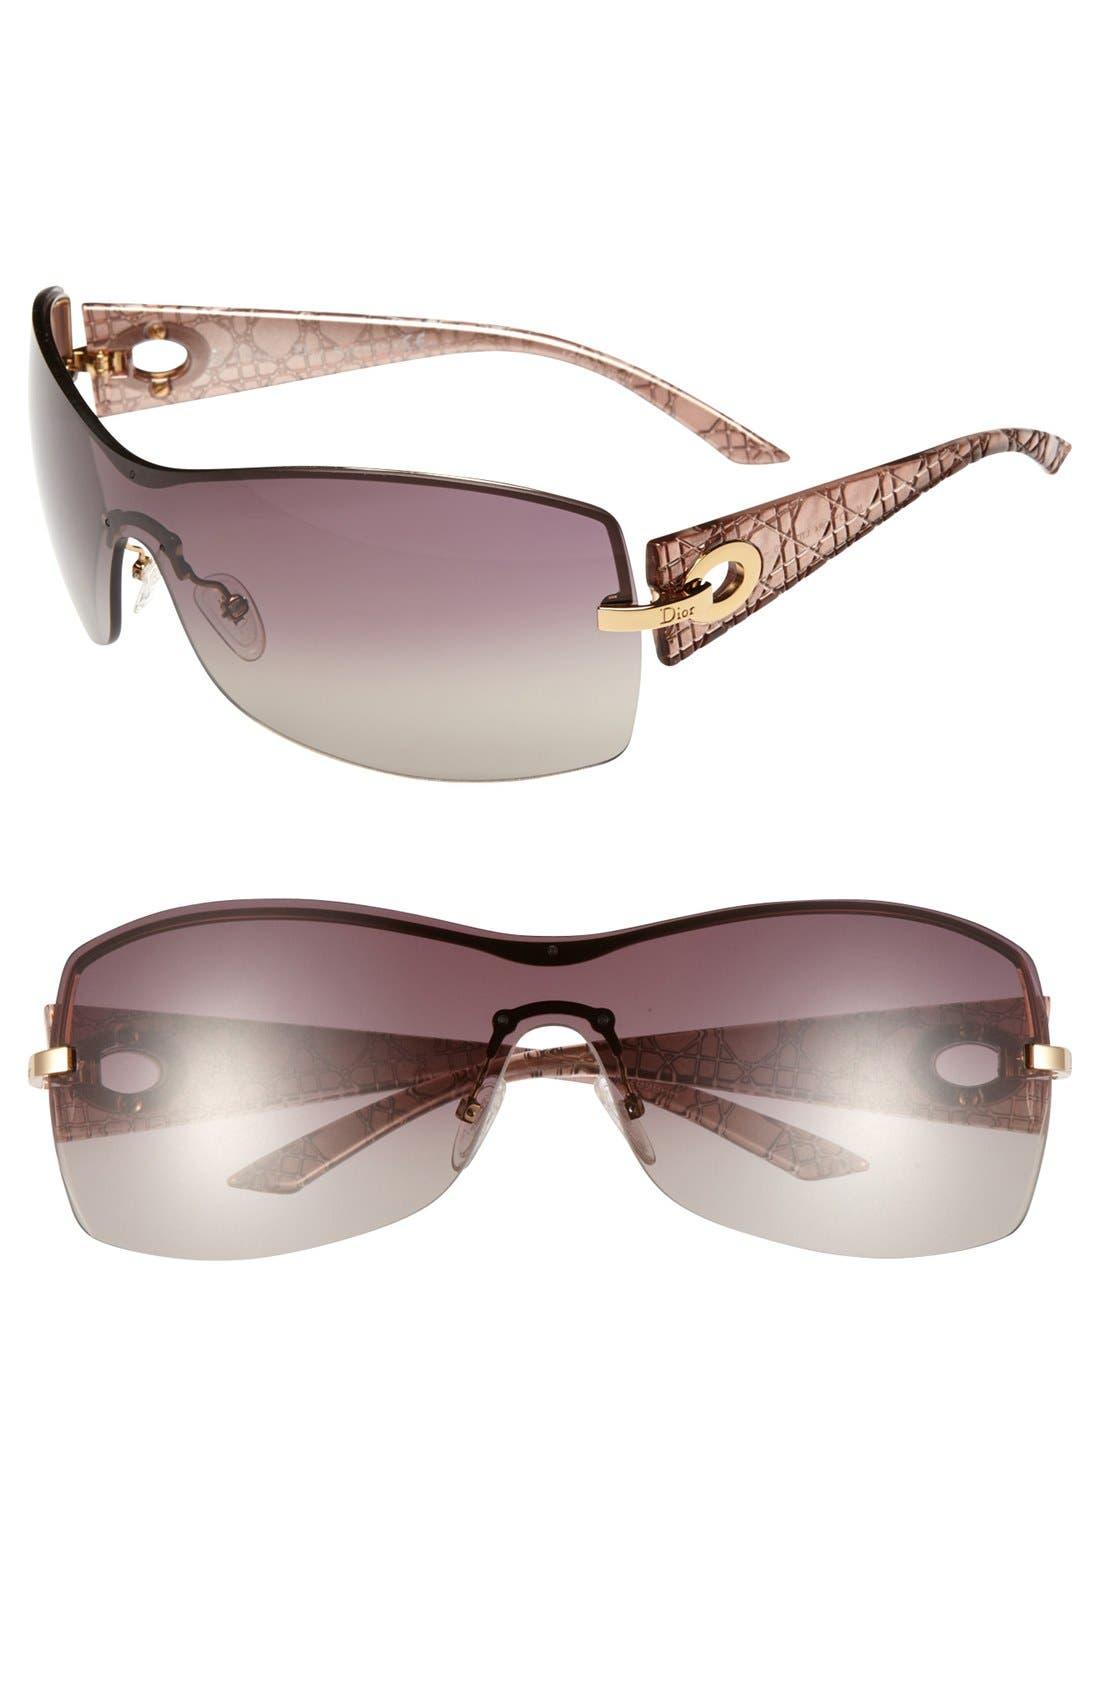 Main Image - Dior 'My Lady Dior 4' 99mm Shield Sunglasses